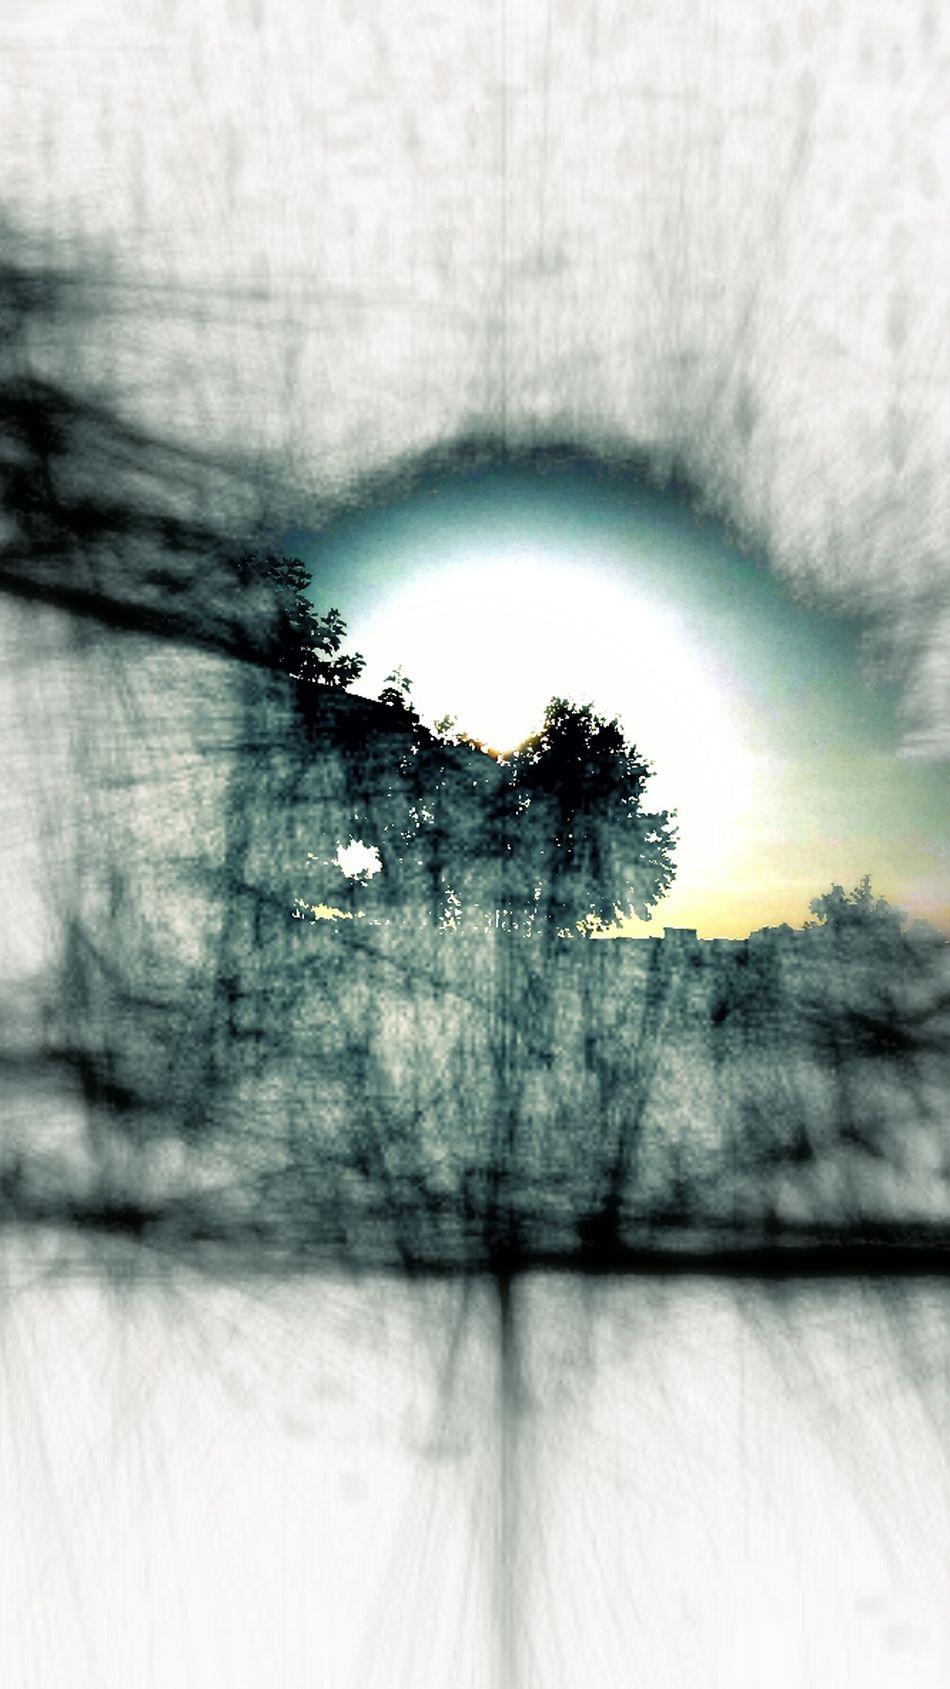 Creative Edit Polar, Blue Light Abstract Nature Ethereal